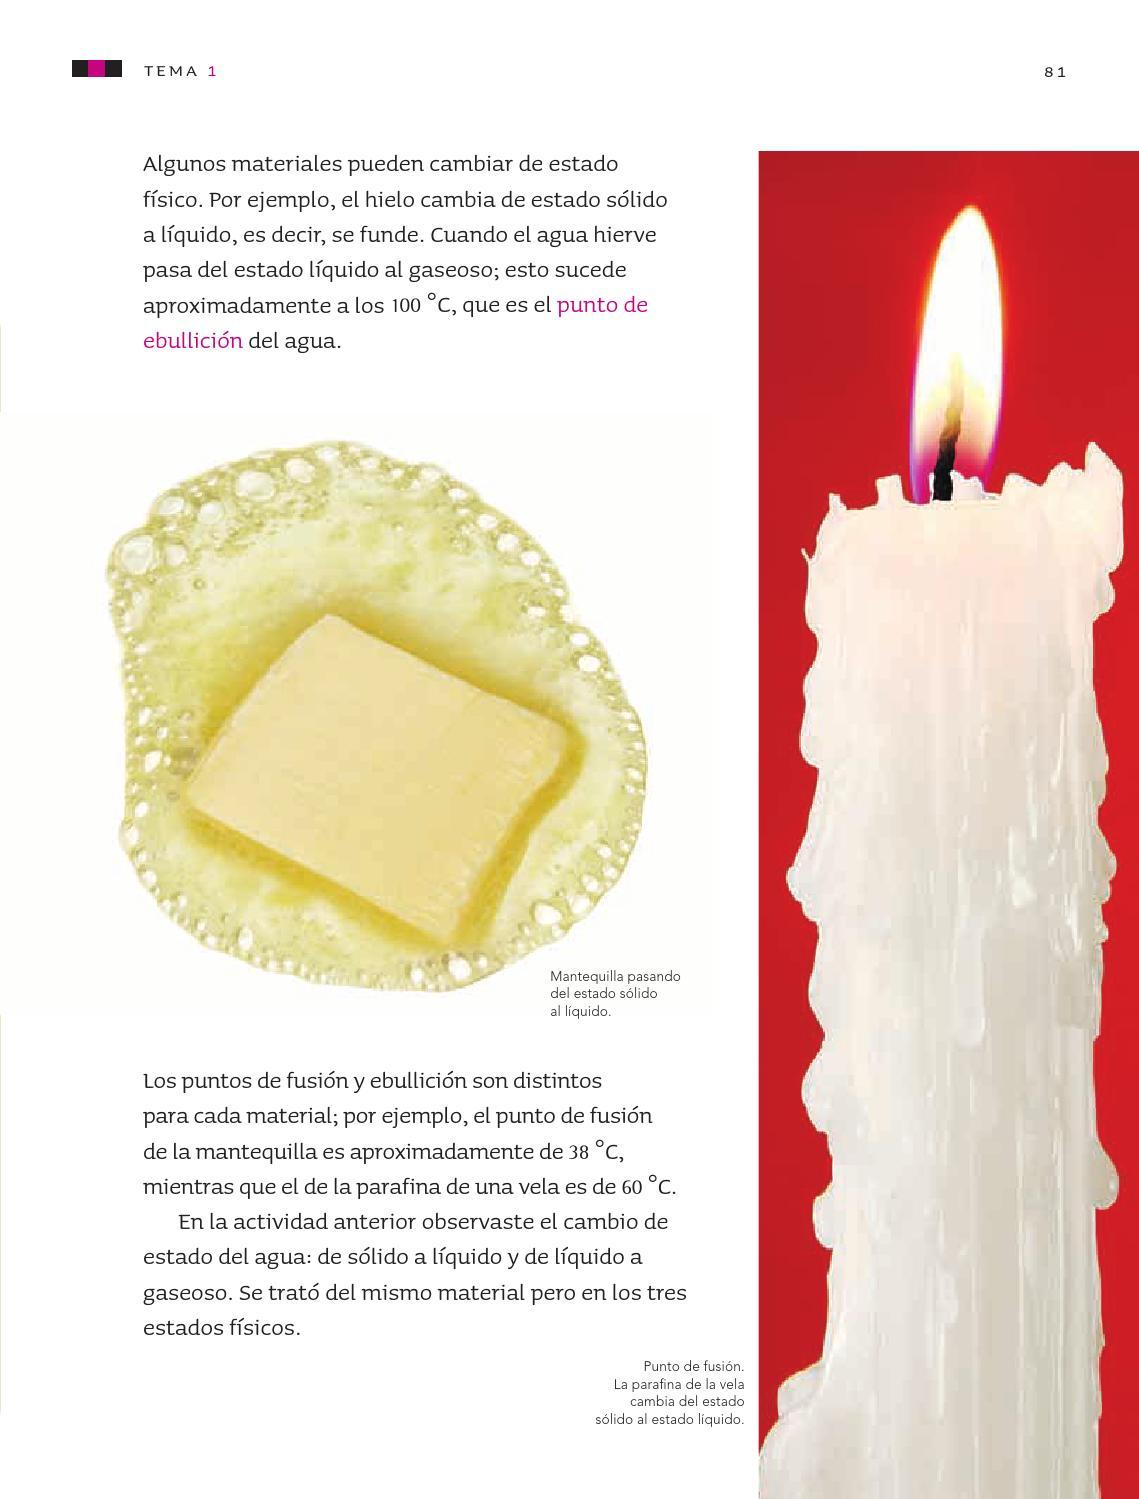 Ciencias naturales 4o grado by rar muri issuu - Transferir fotos a velas ...